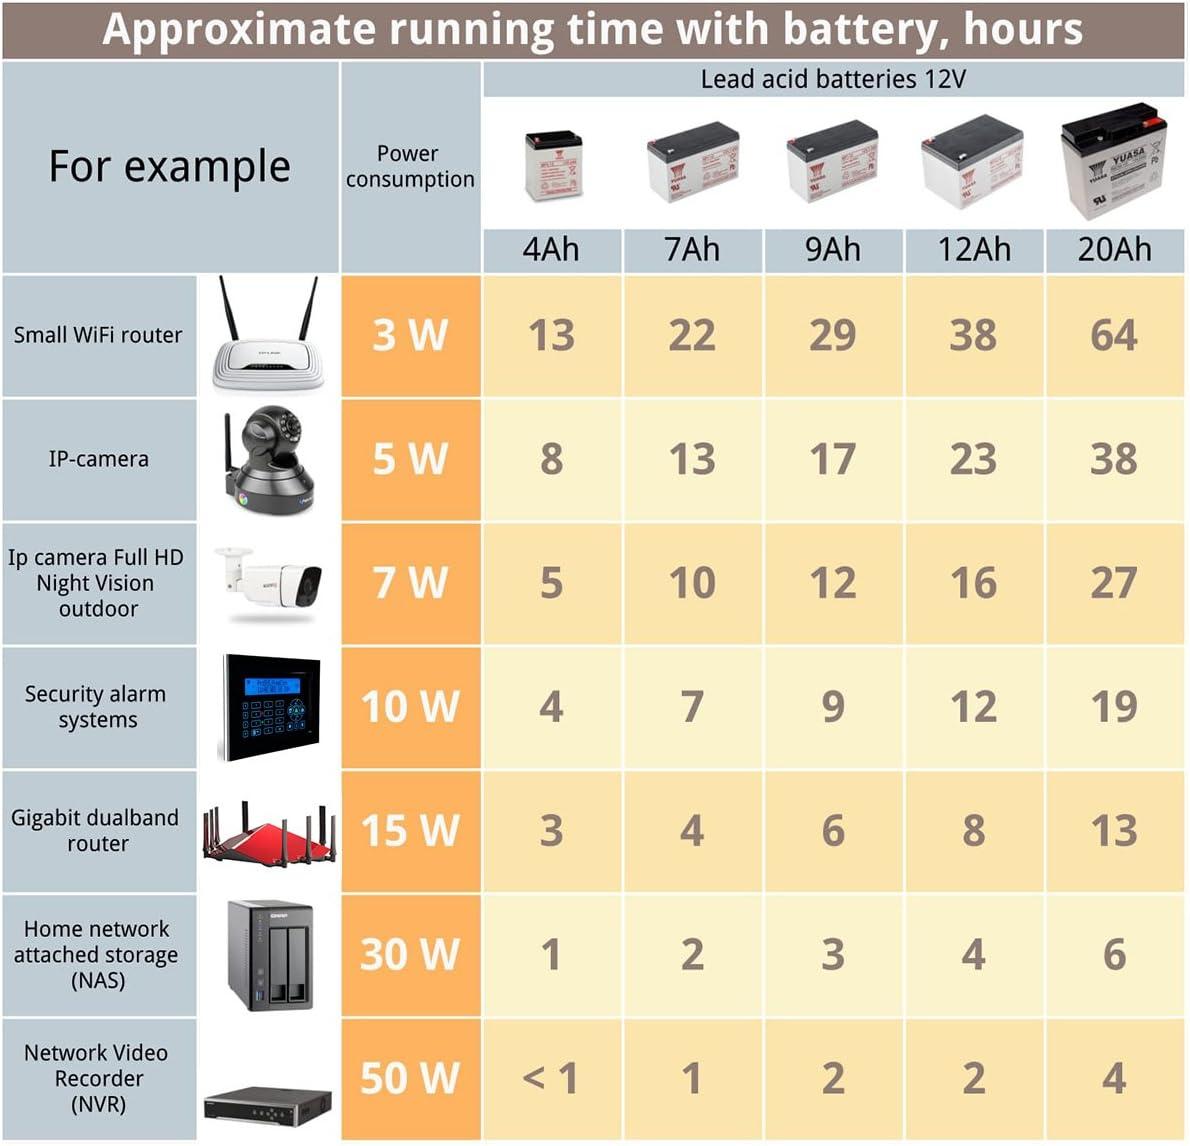 13.8V 4A Proline DC UPS 60W 12V 1A Battery Charger Uninterruptible Power Supply